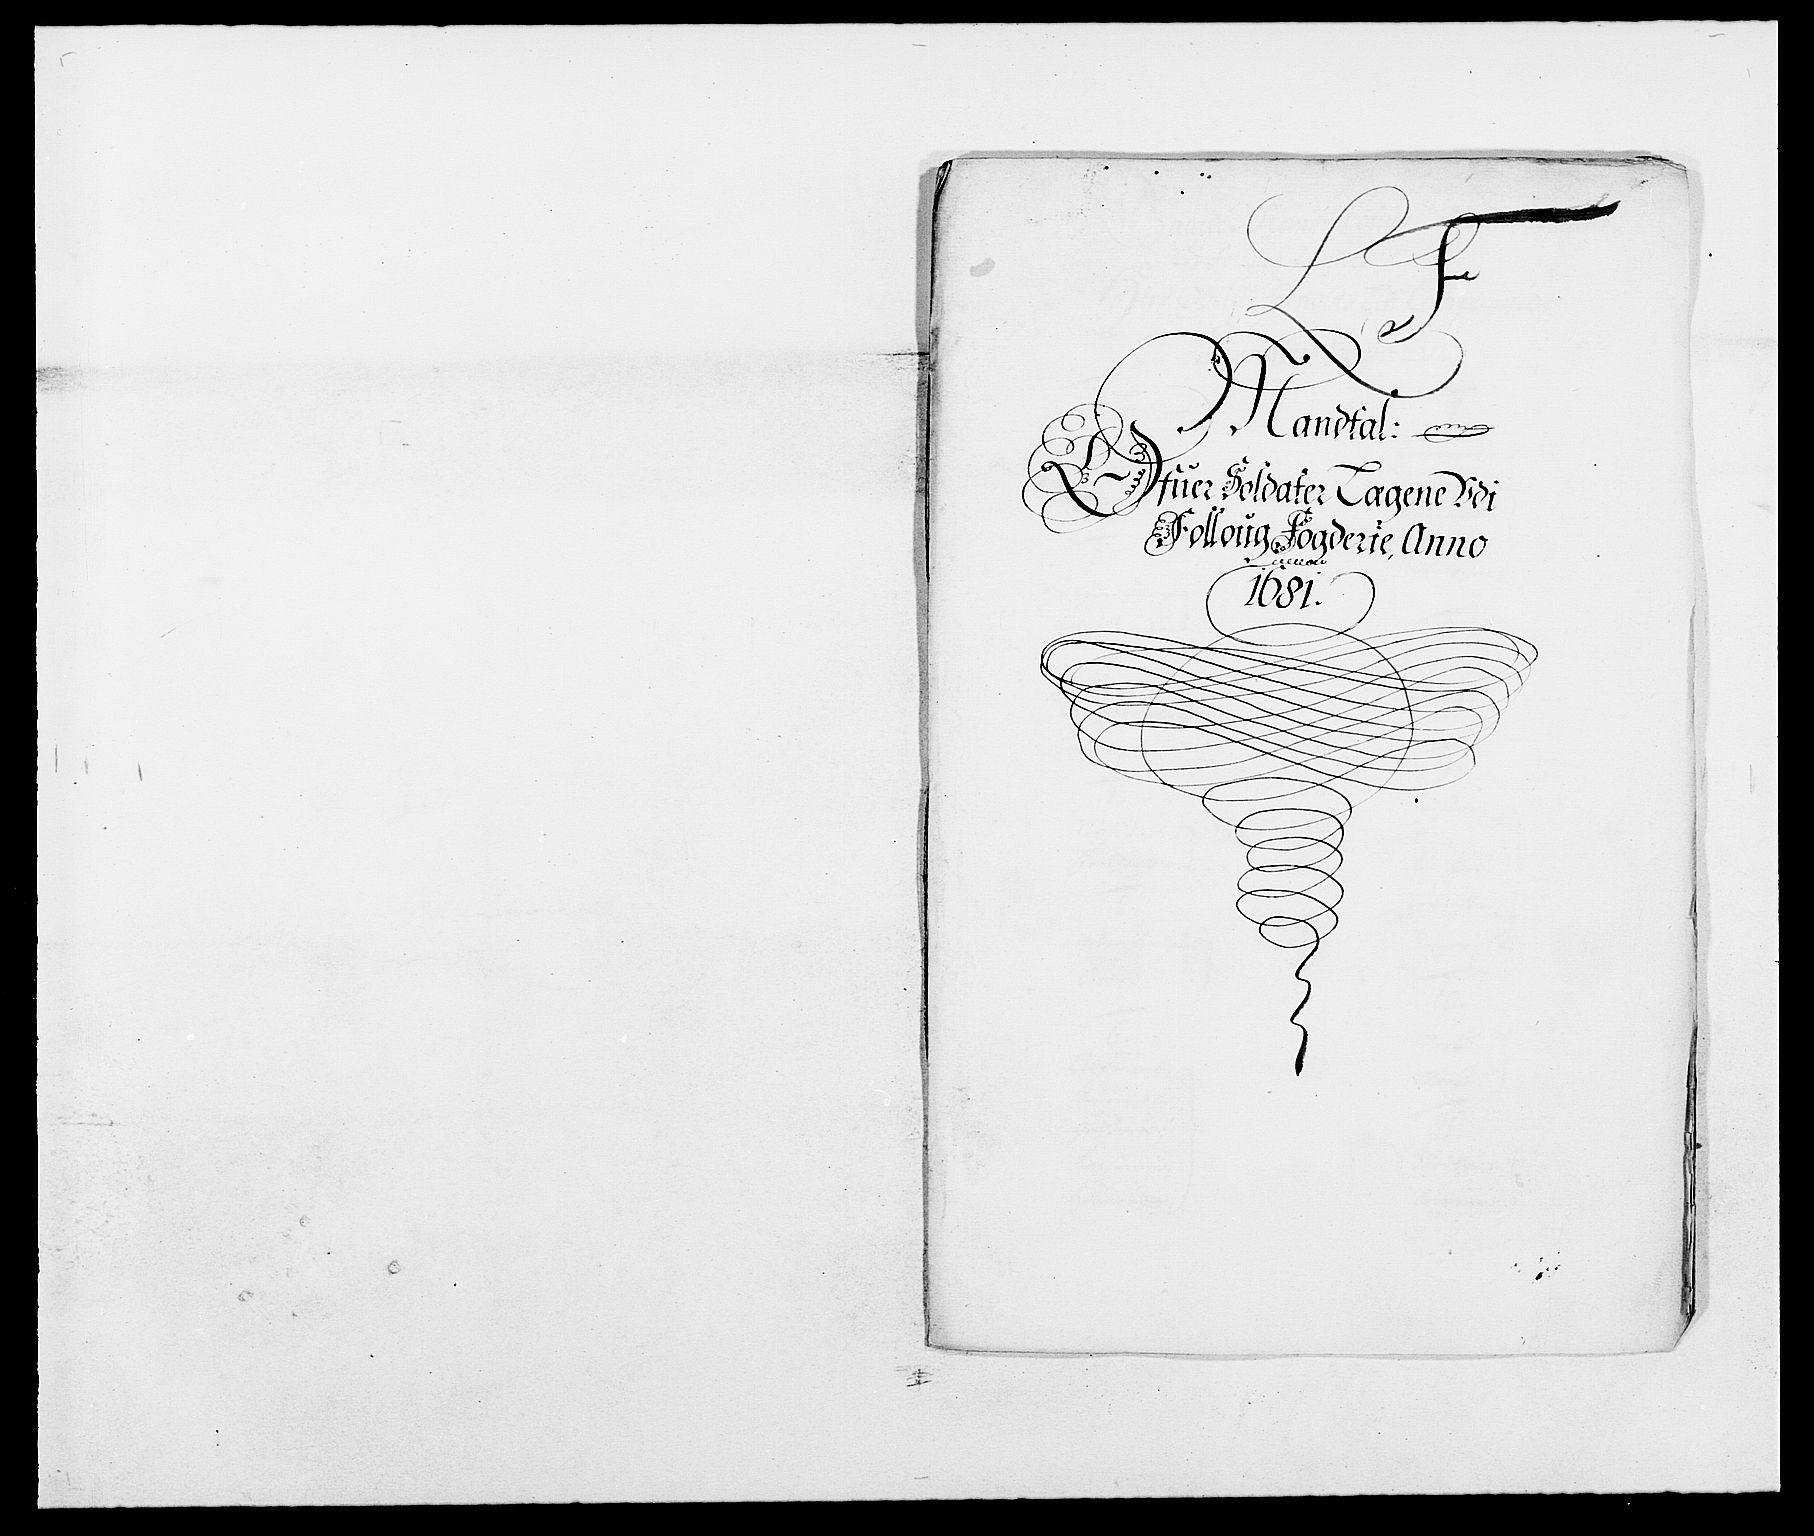 RA, Rentekammeret inntil 1814, Reviderte regnskaper, Fogderegnskap, R09/L0429: Fogderegnskap Follo, 1680-1681, s. 363